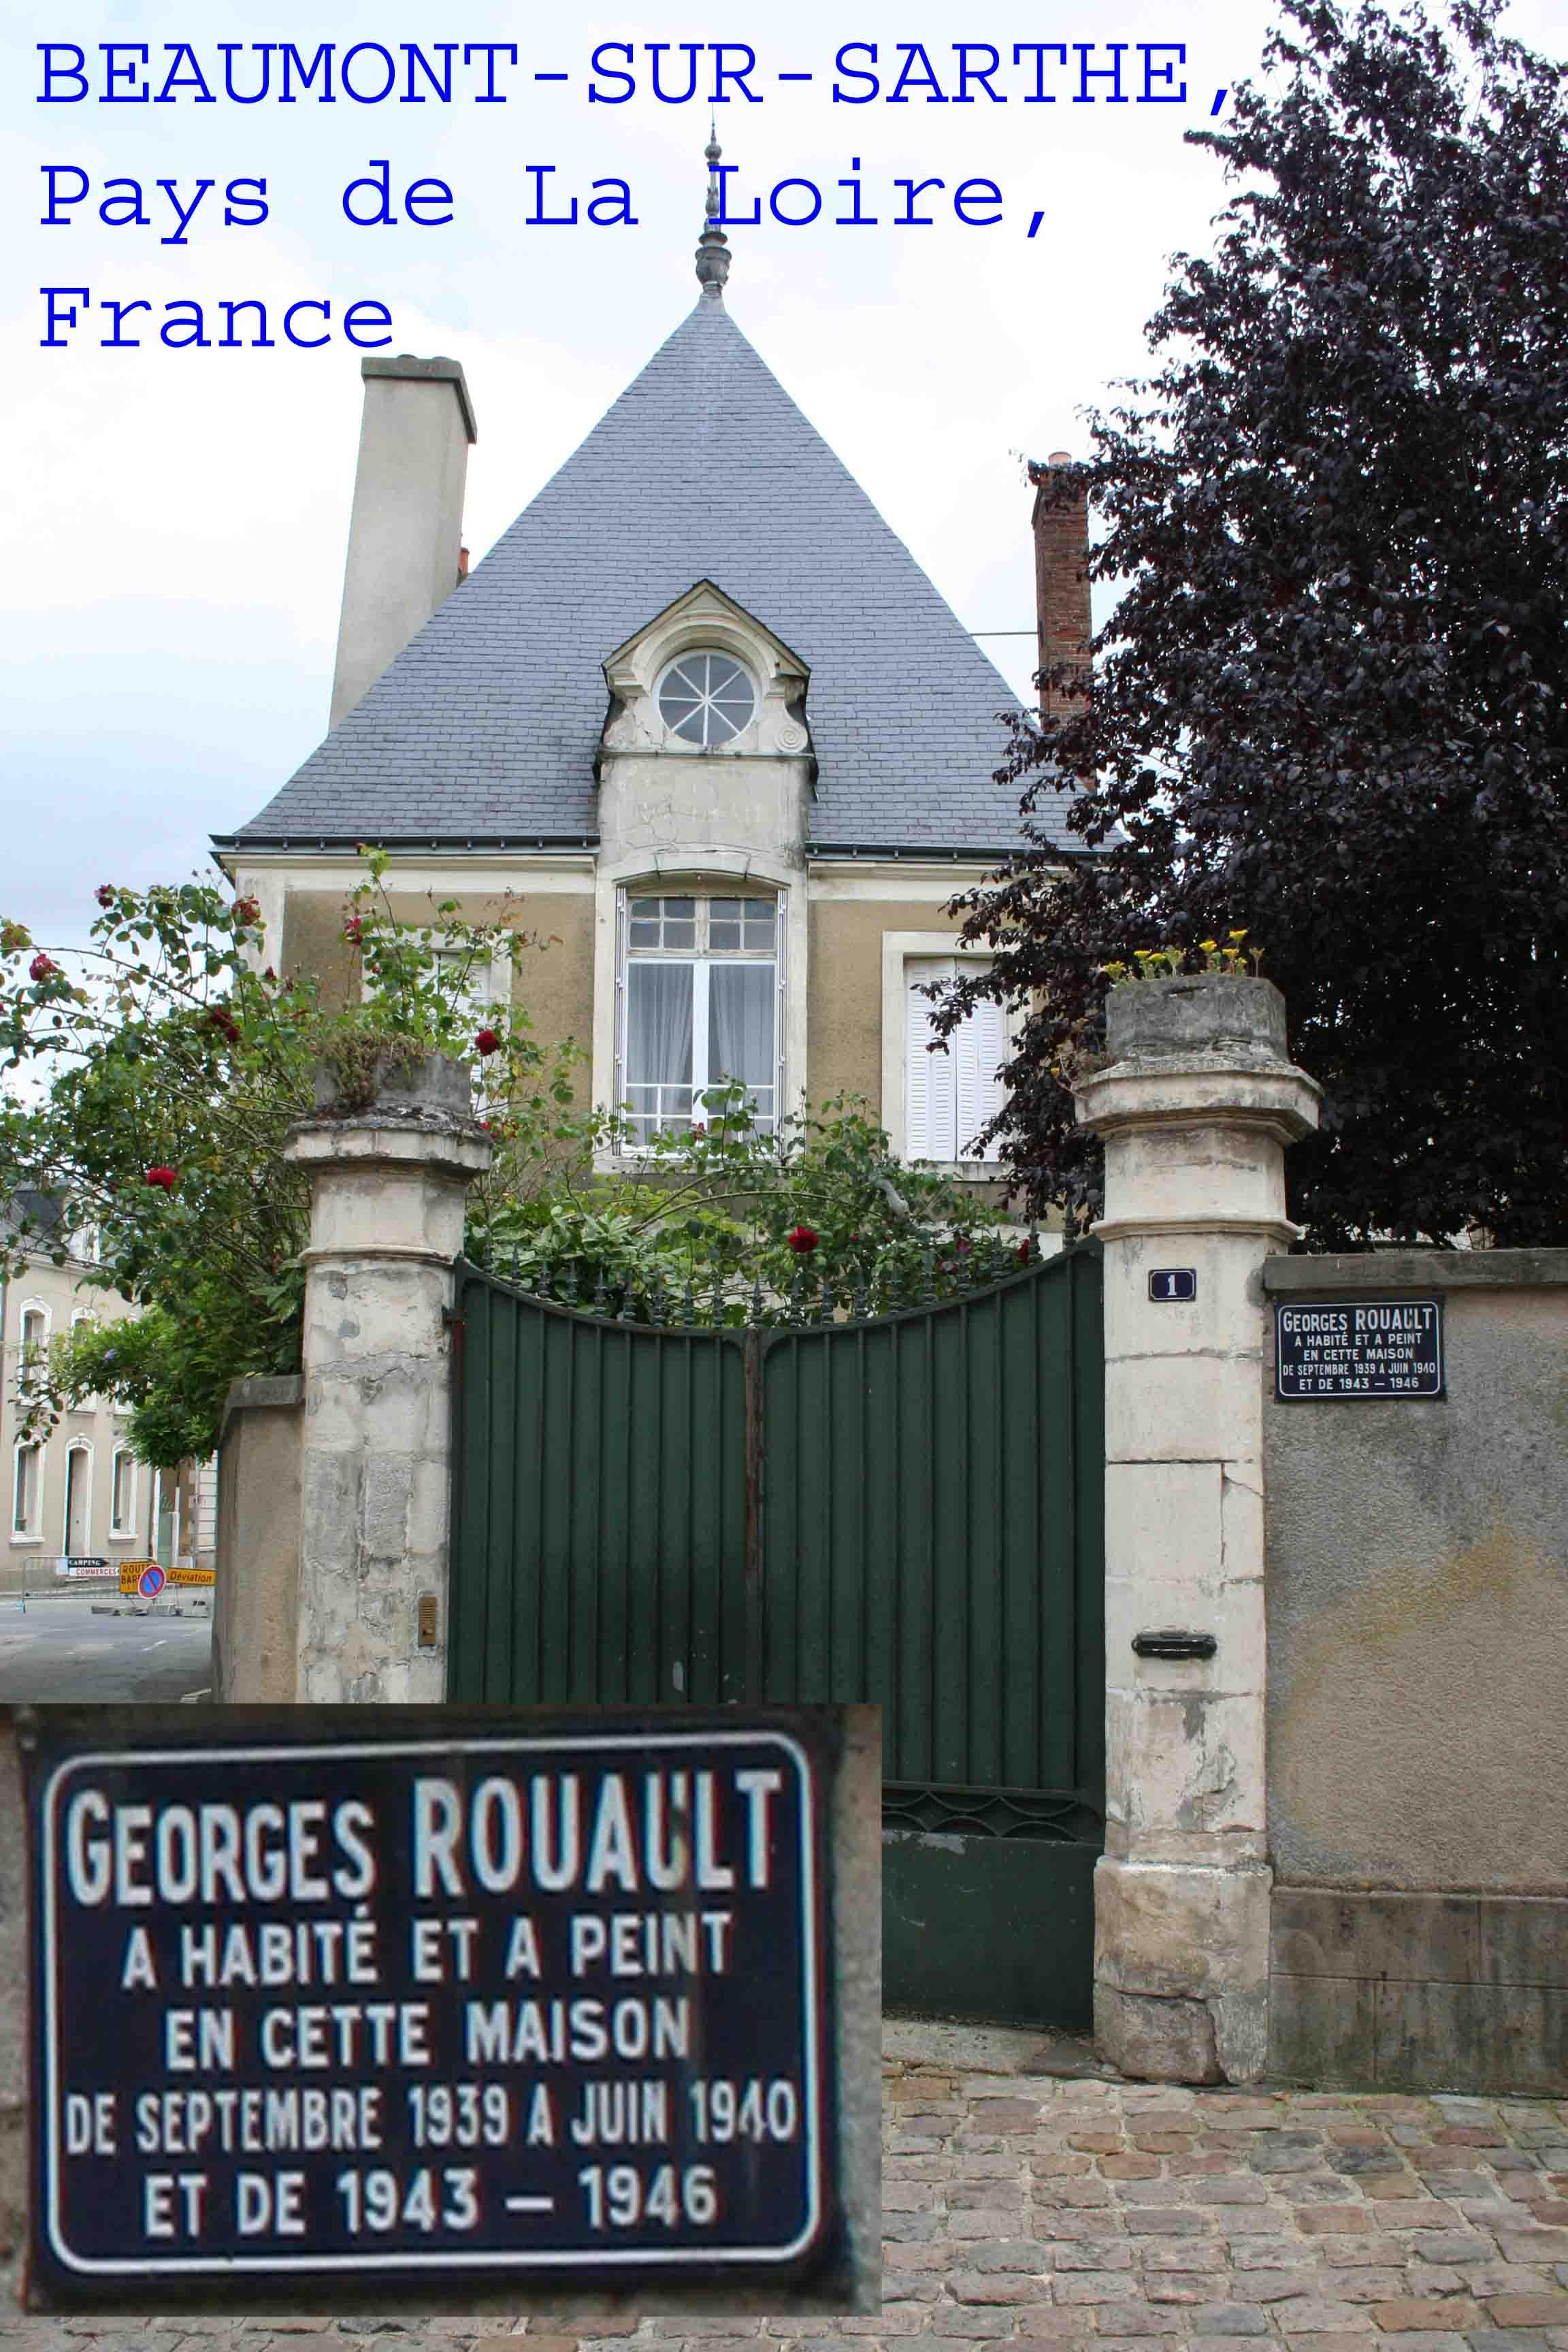 Georges Rouault – Wikipedia concernant Etoil Clown